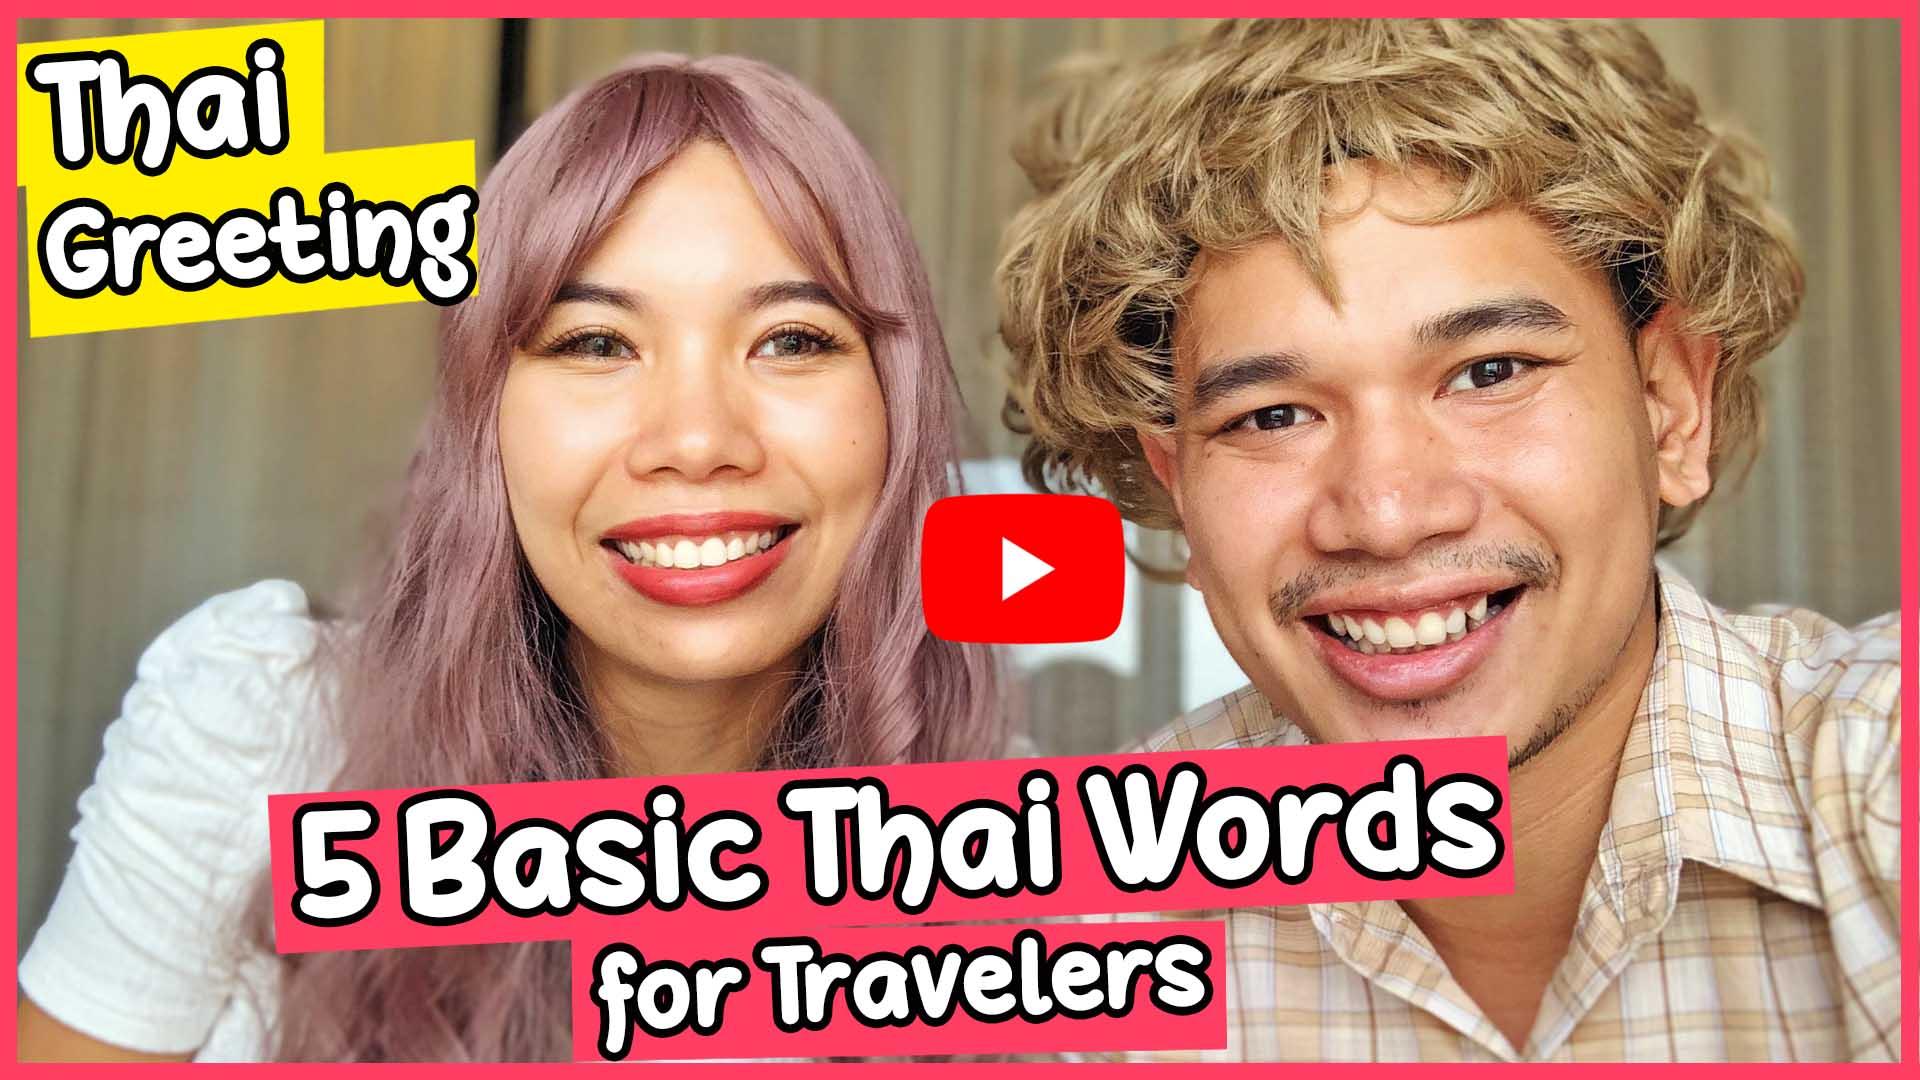 Bangkok-Guide-Smile-Private-Tour-Mandy-Thumbnail-Basic-Thai-Words-Greeting-02.jpg